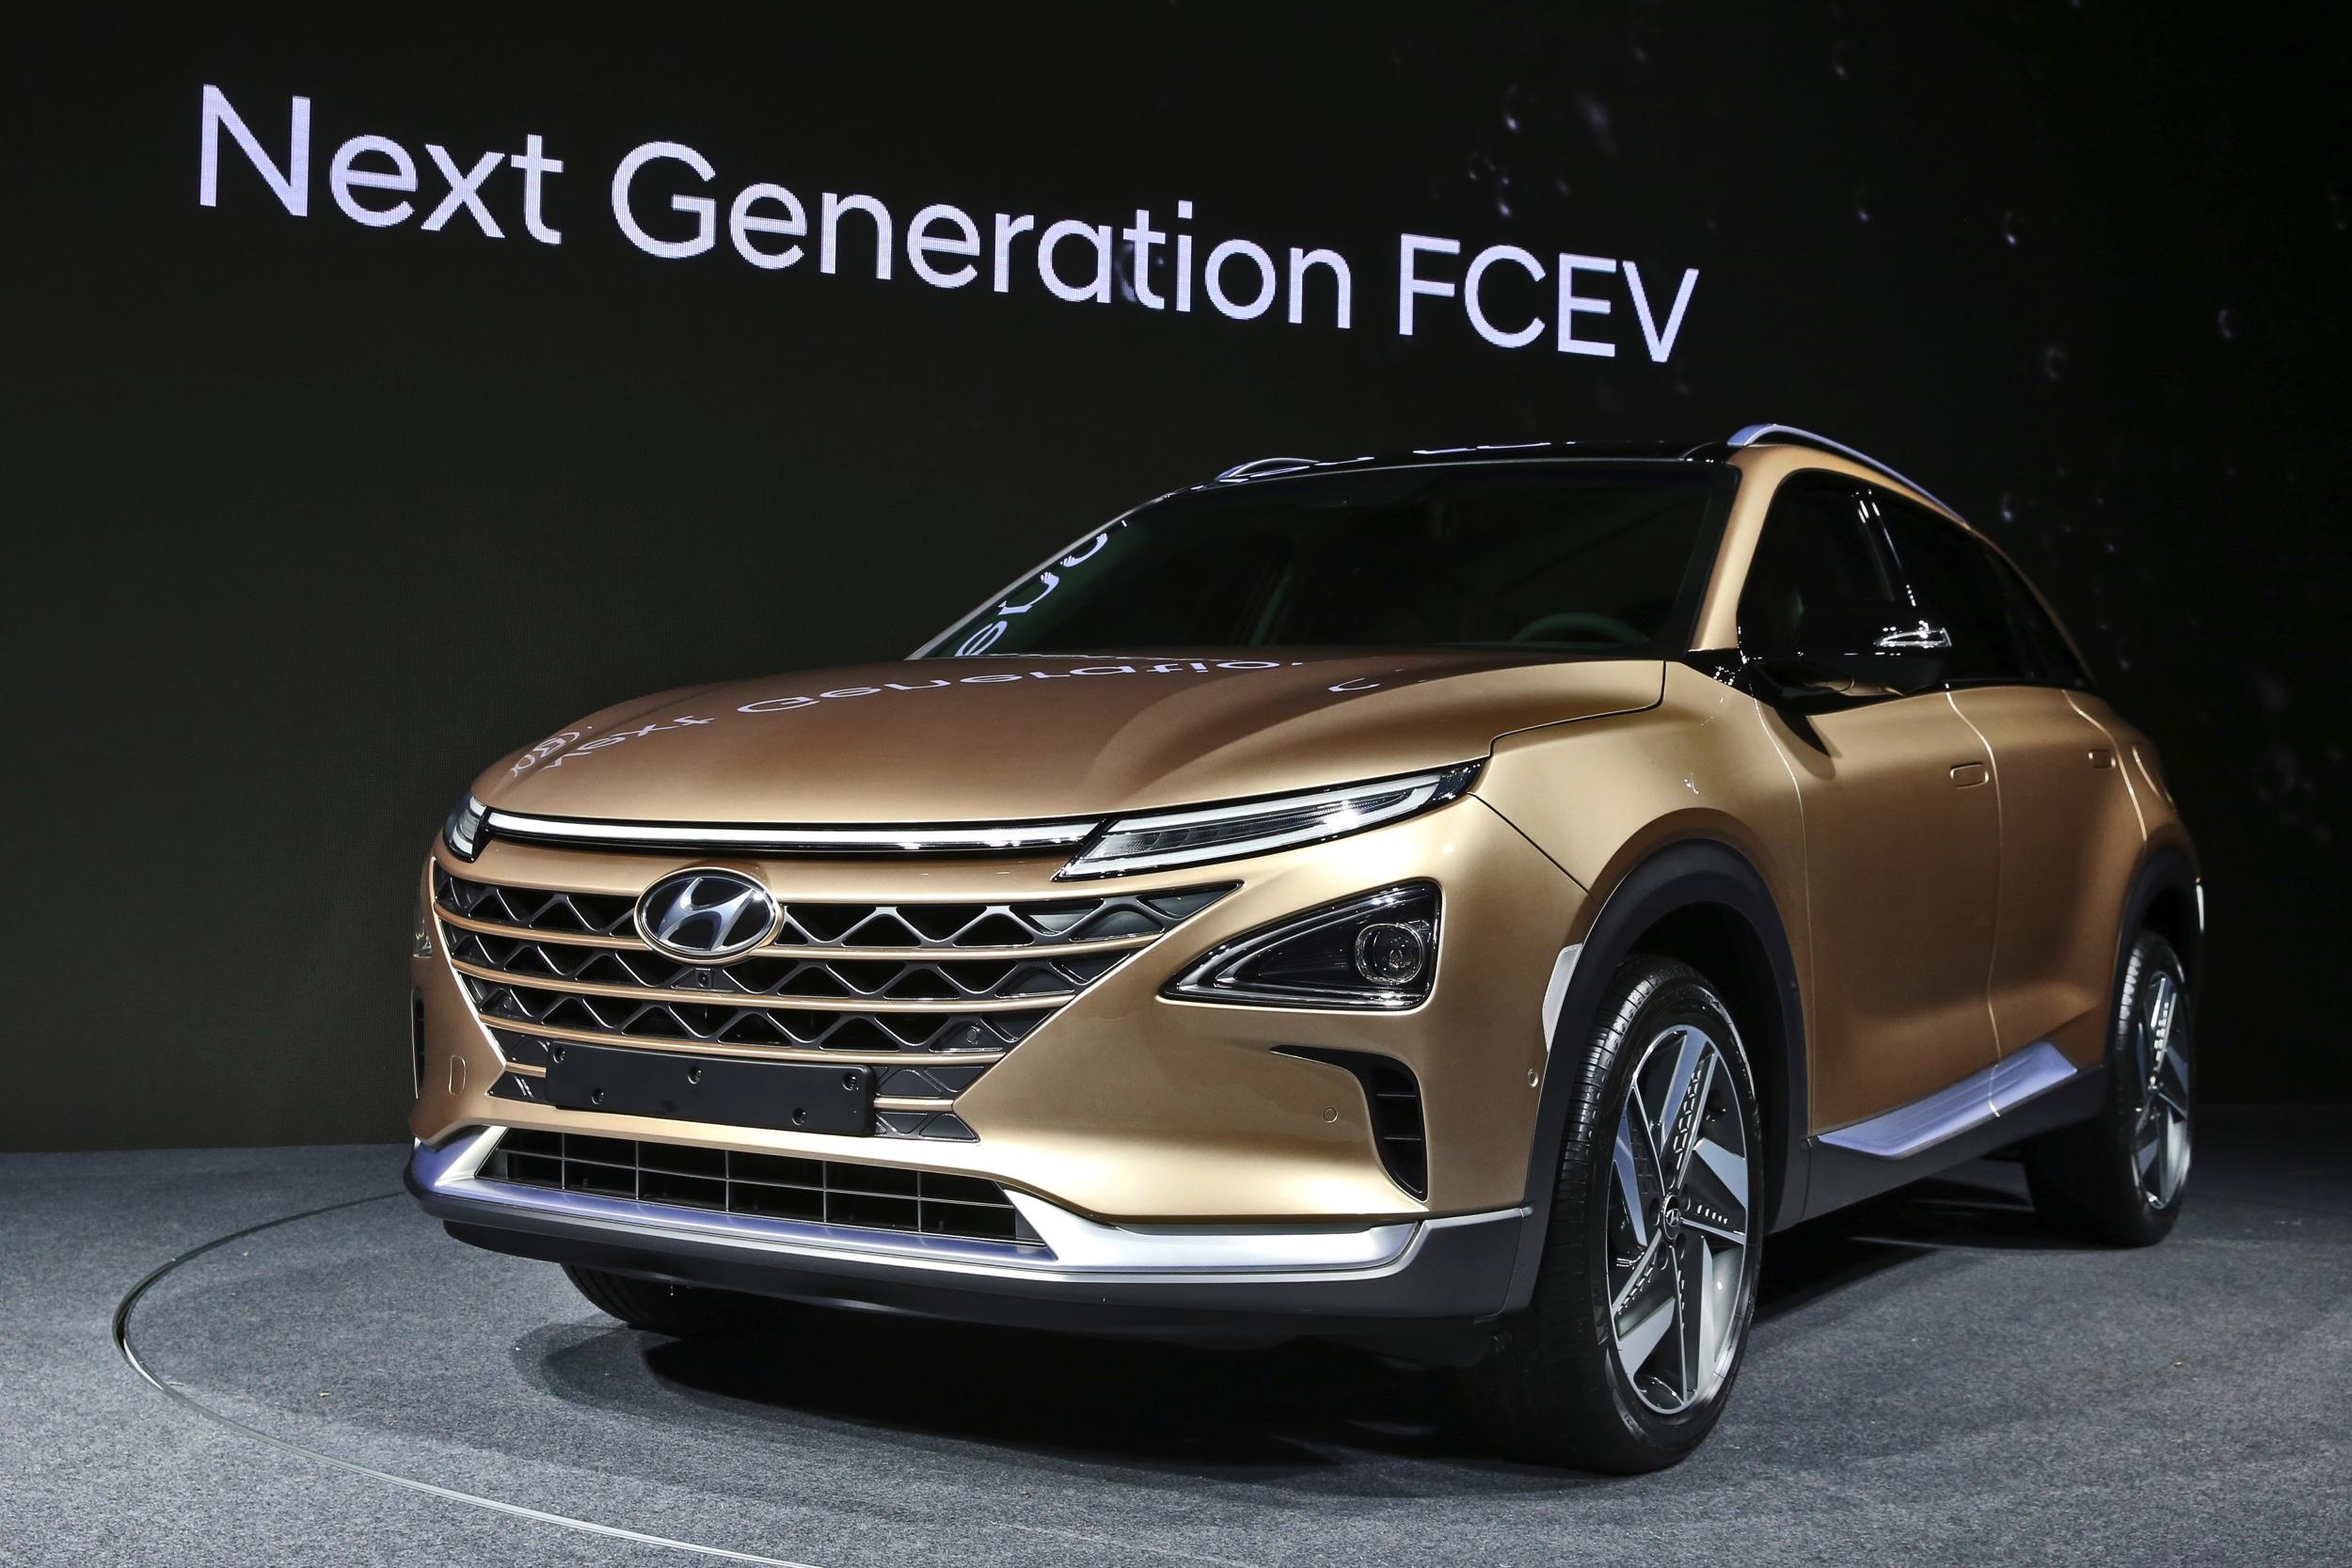 hyundai-next-generation-fcev-1-autovisie-nl